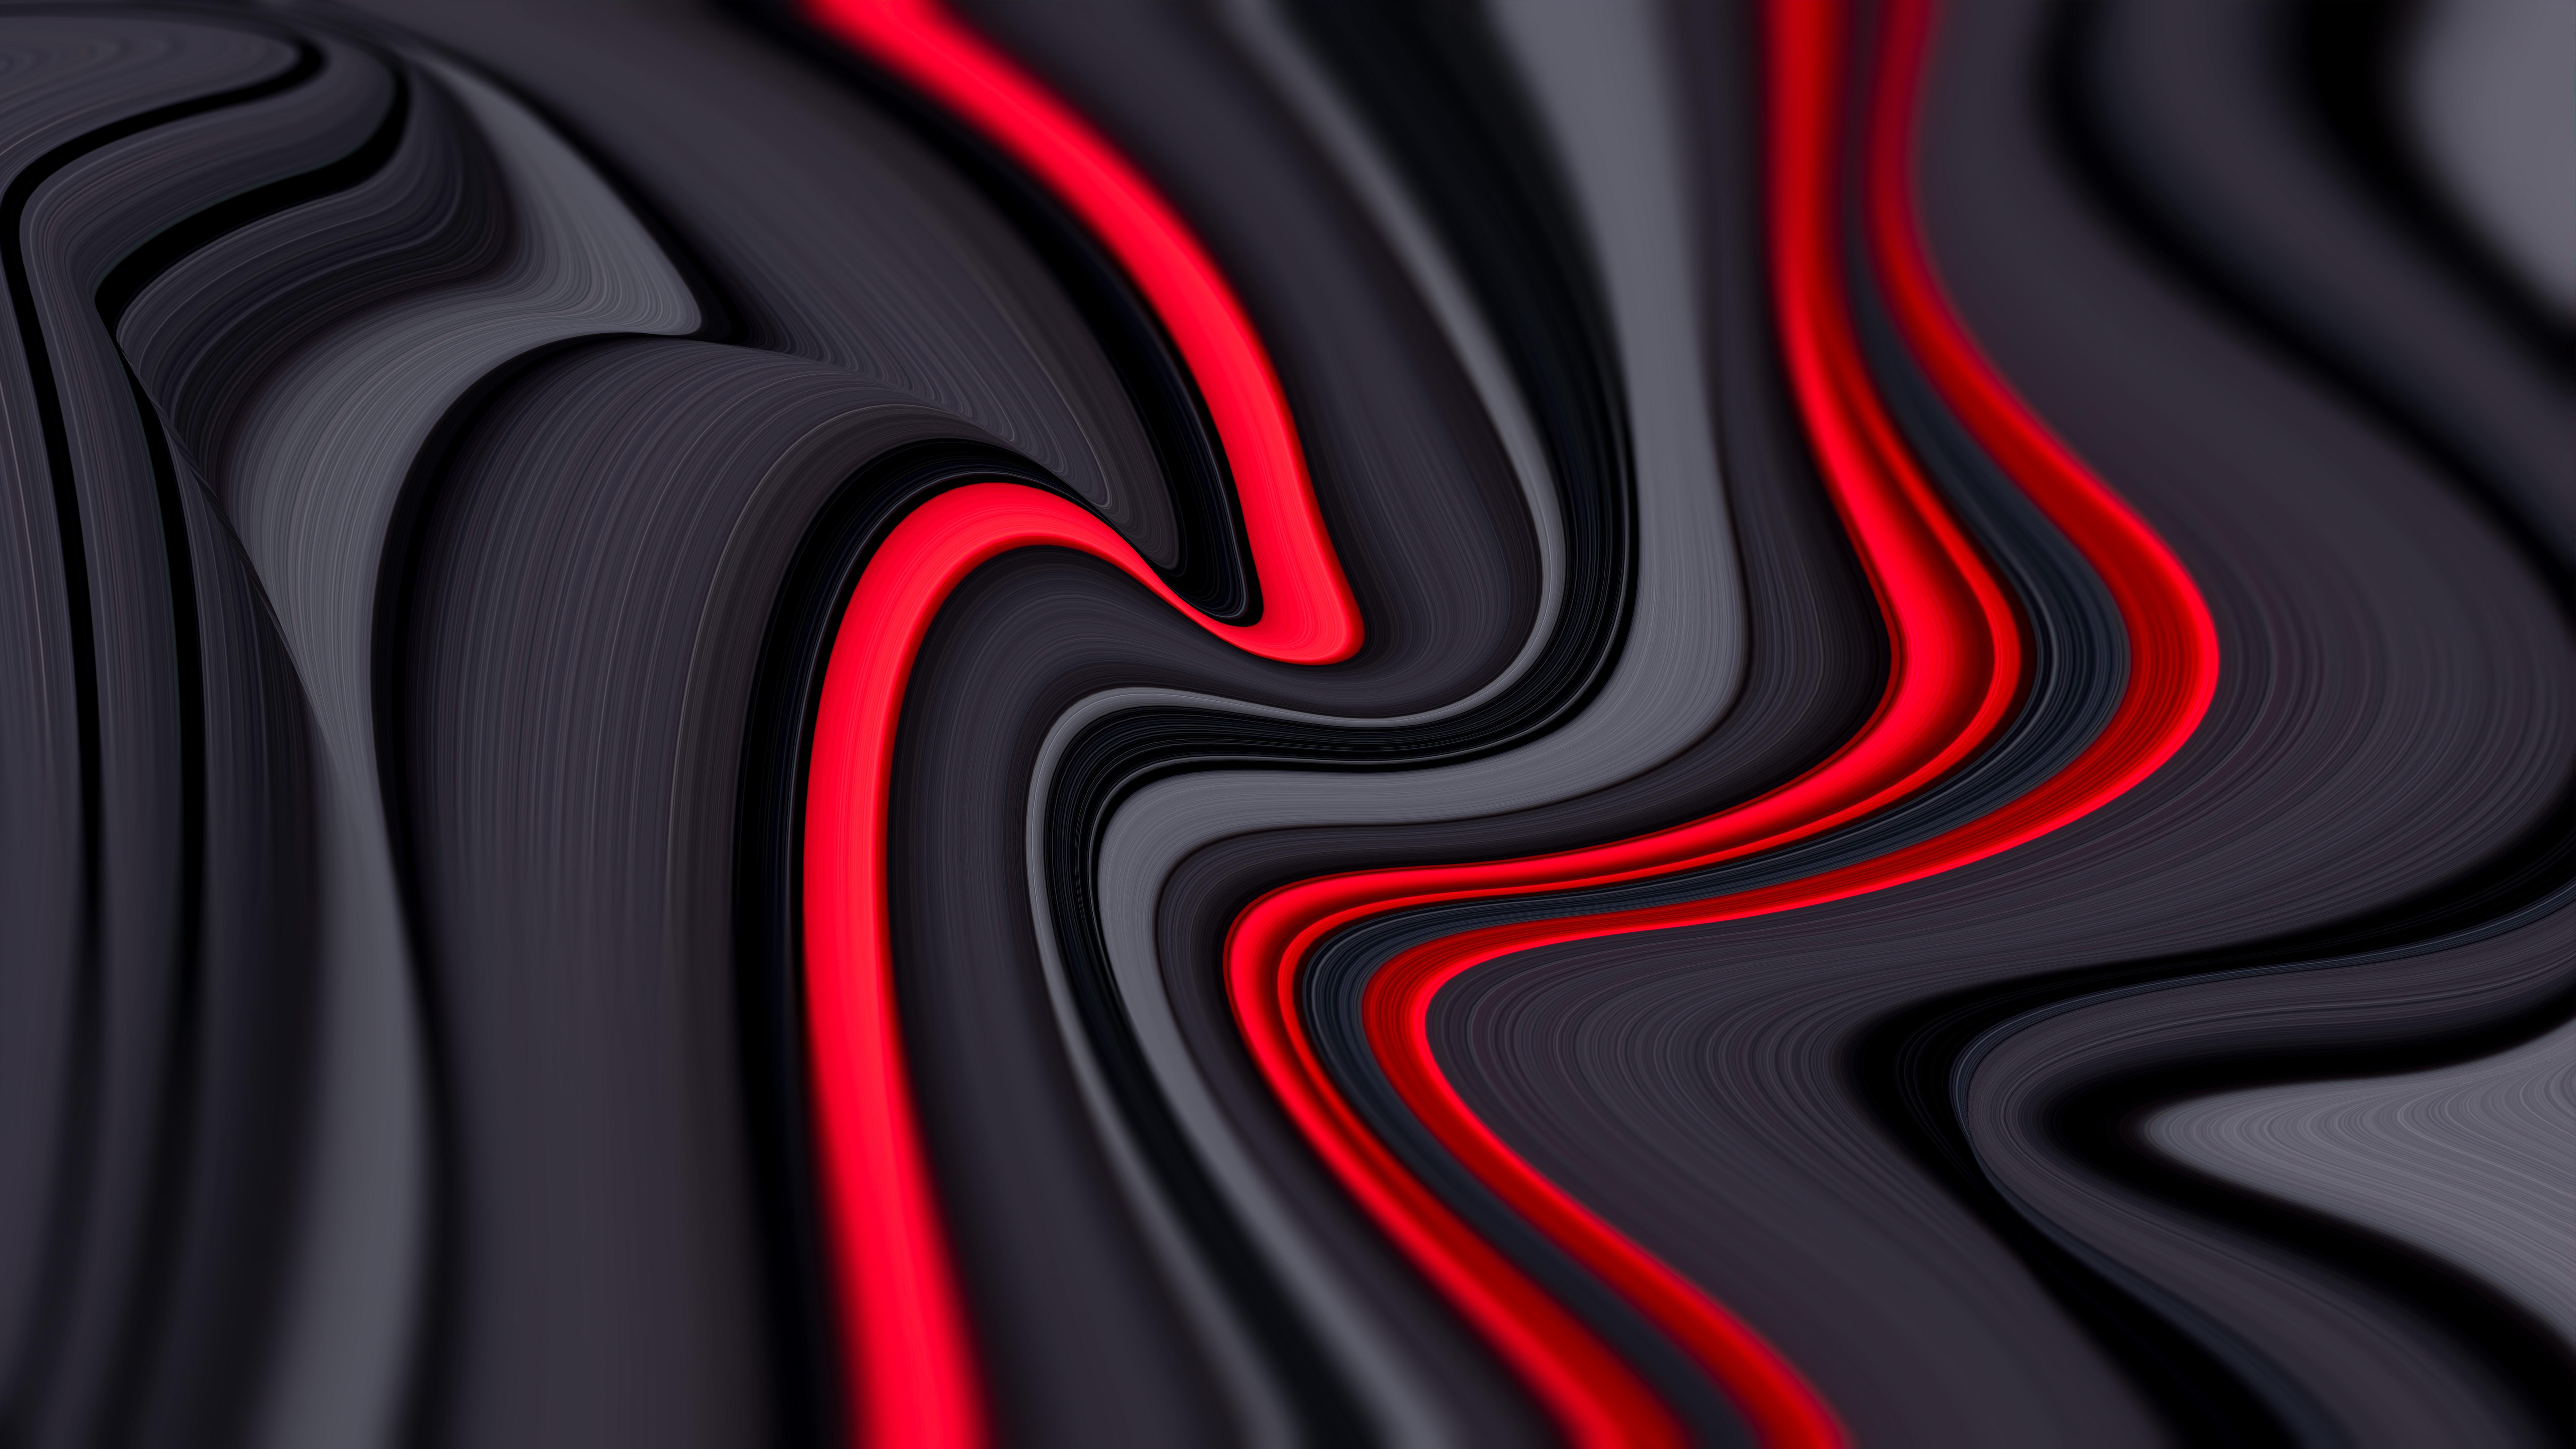 red inside grey design 4k 1620165379 - Red Inside Grey Design 4k - Red Inside Grey Design 4k wallpapers